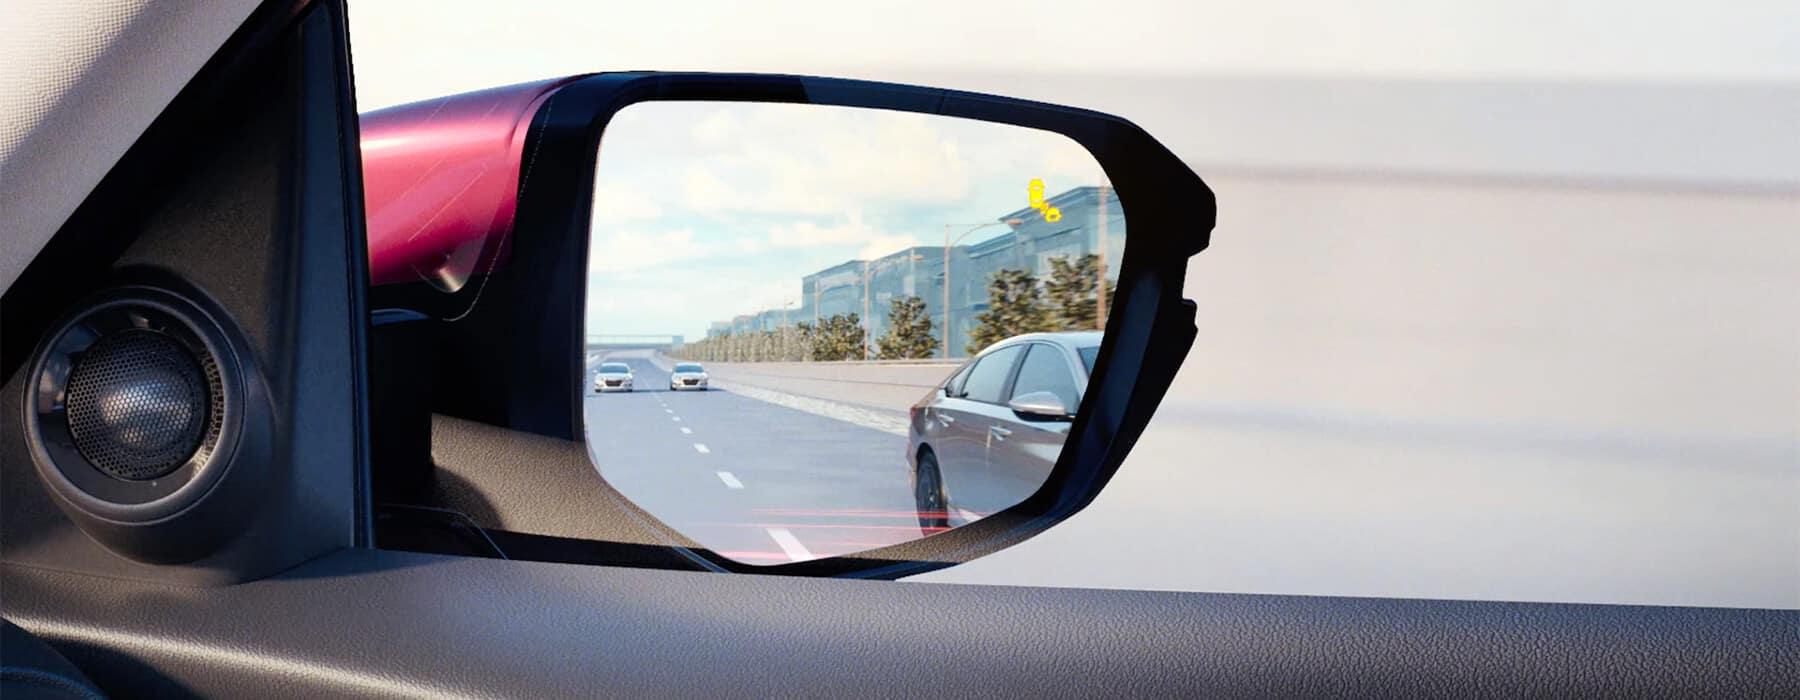 Honda Blind Spot Information System (BSI) Slider